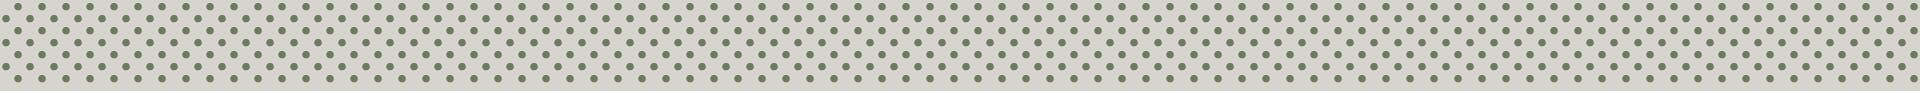 pattern verde